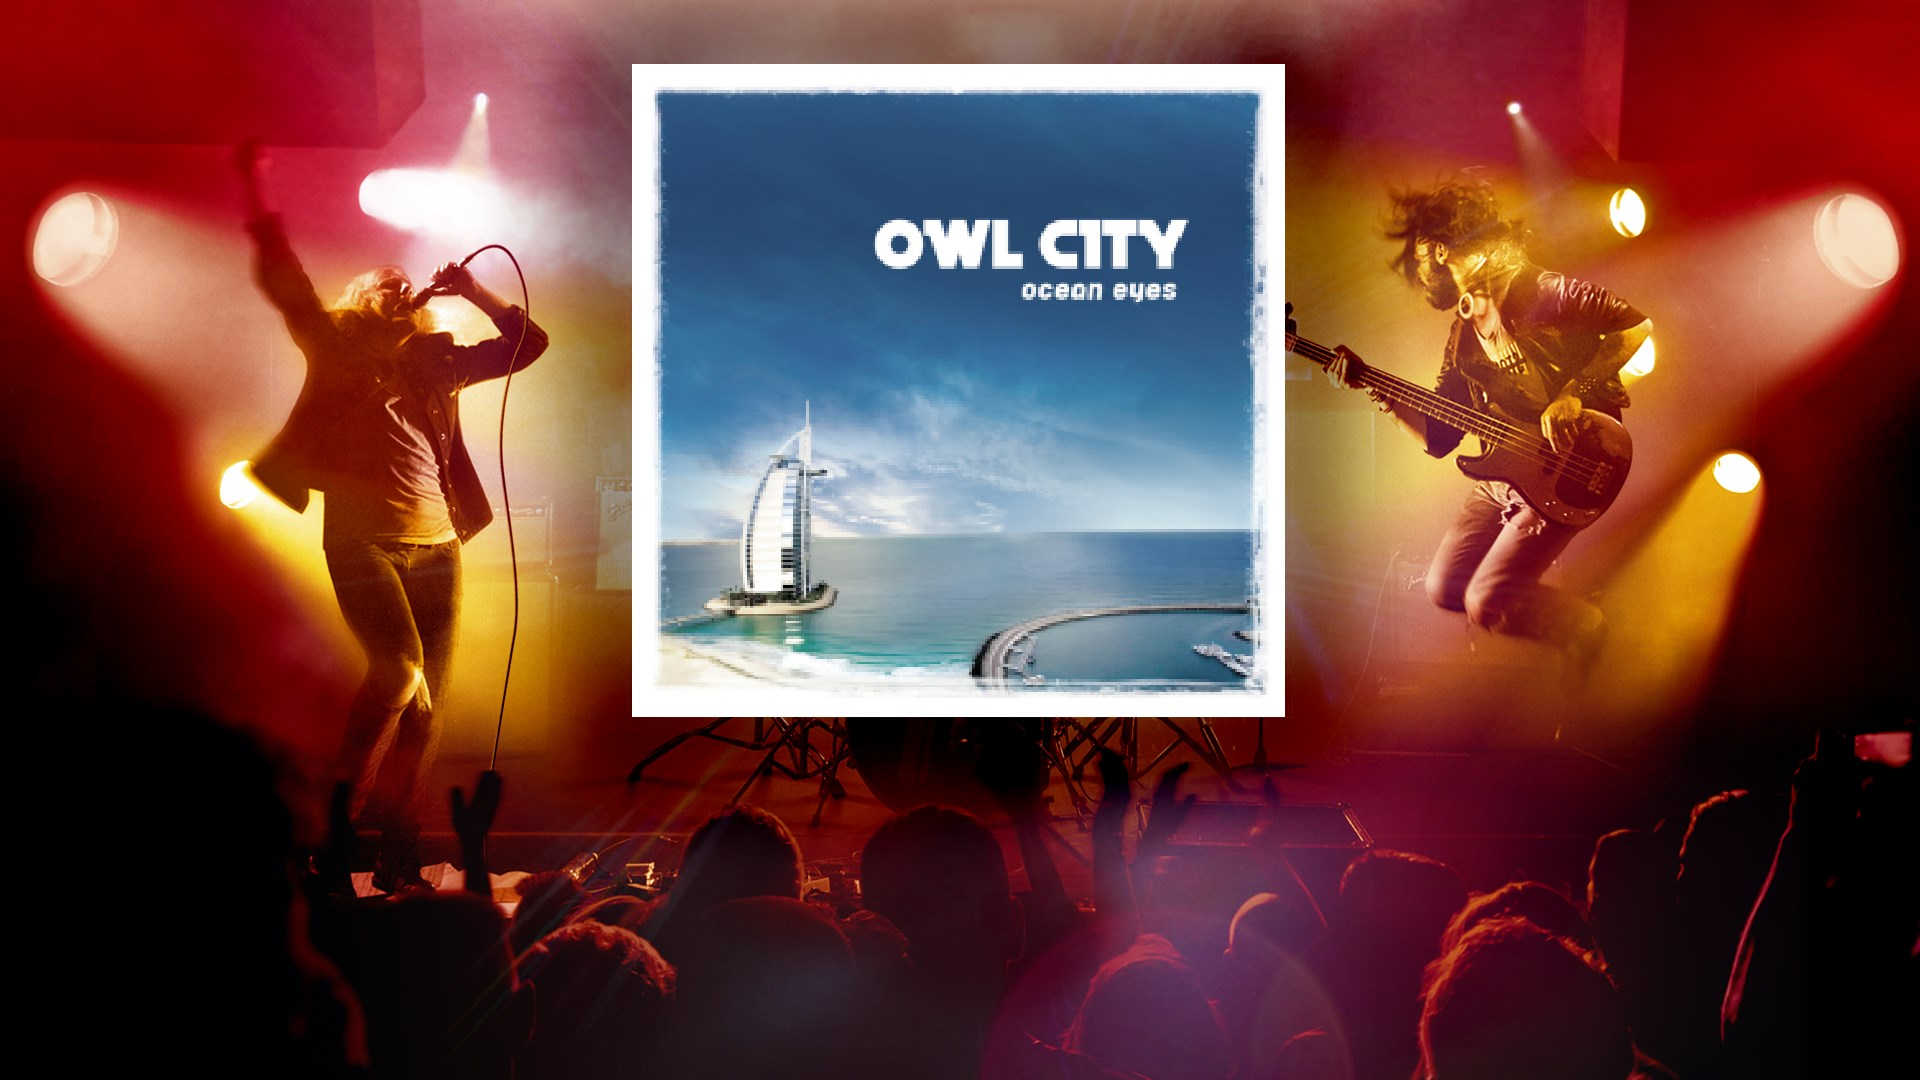 Buy Fireflies Owl City Microsoft Store